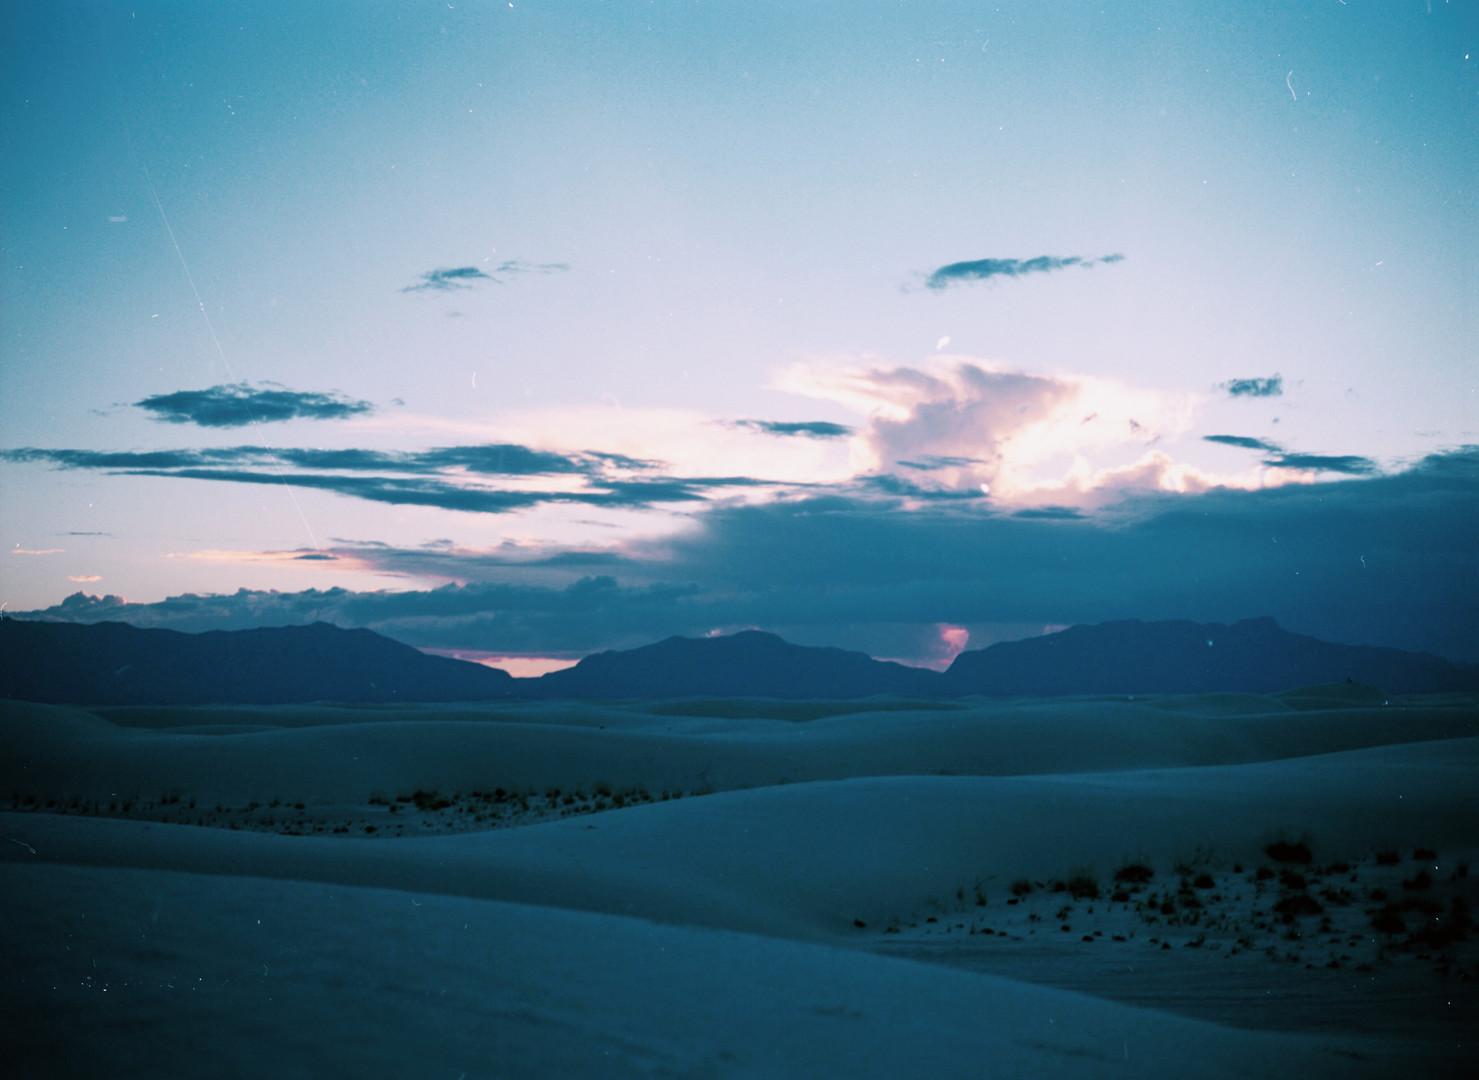 White Sands at Sunset